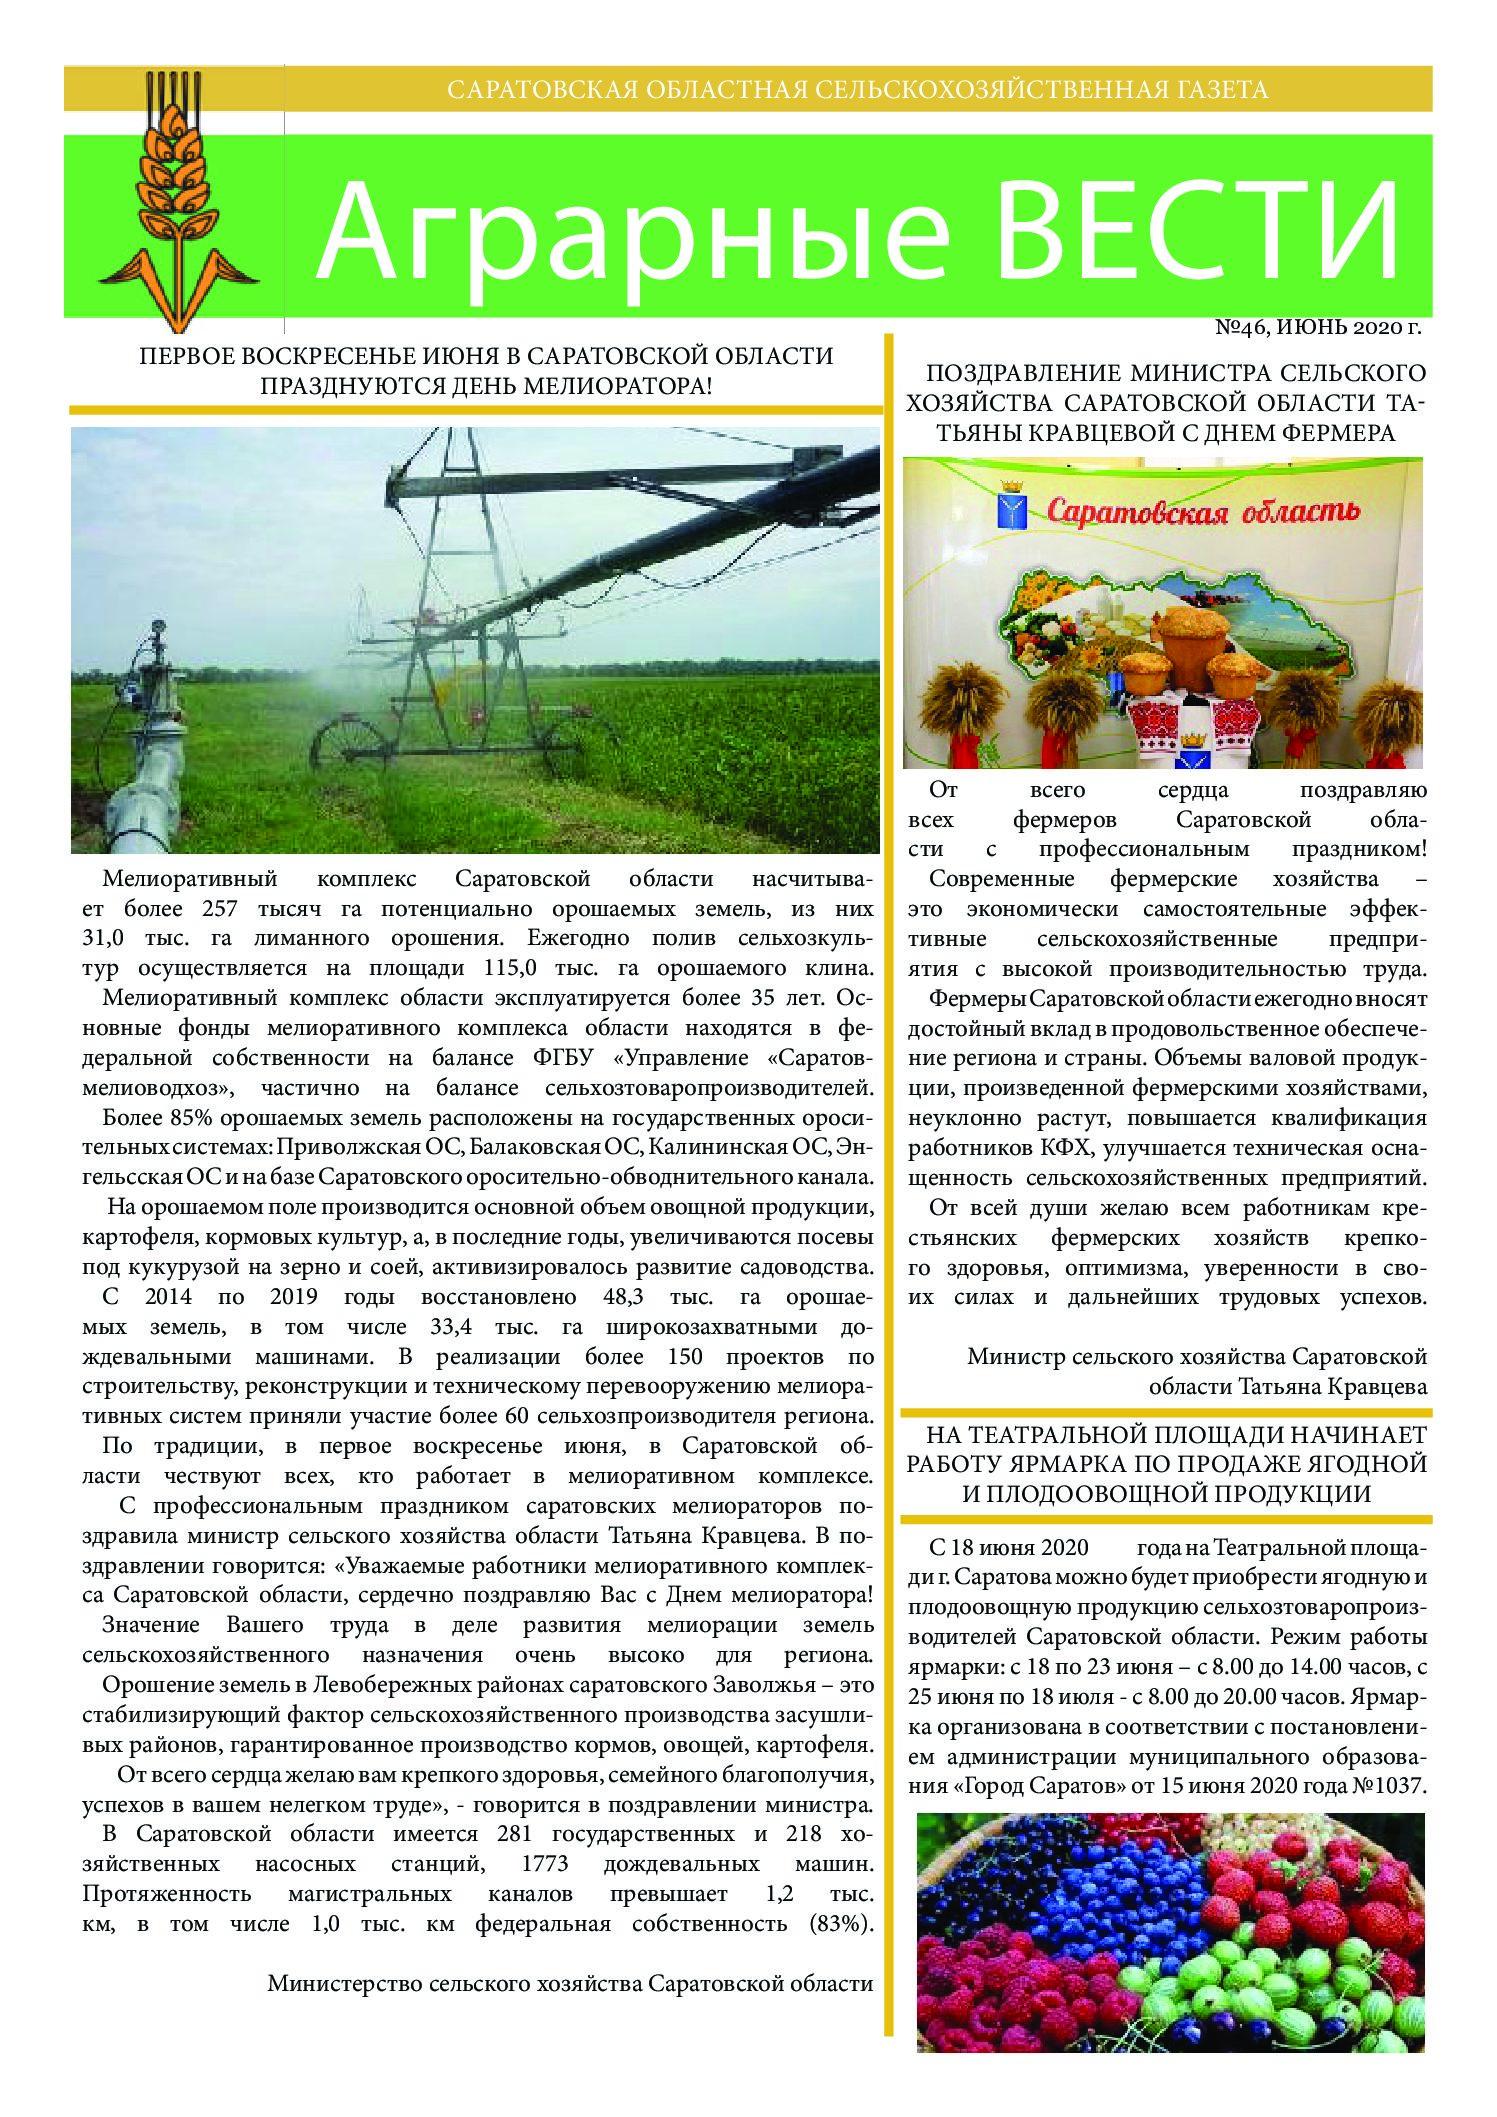 https://saratovagro.ru/wp-content/uploads/2020/08/Июнь46-pdf.jpg